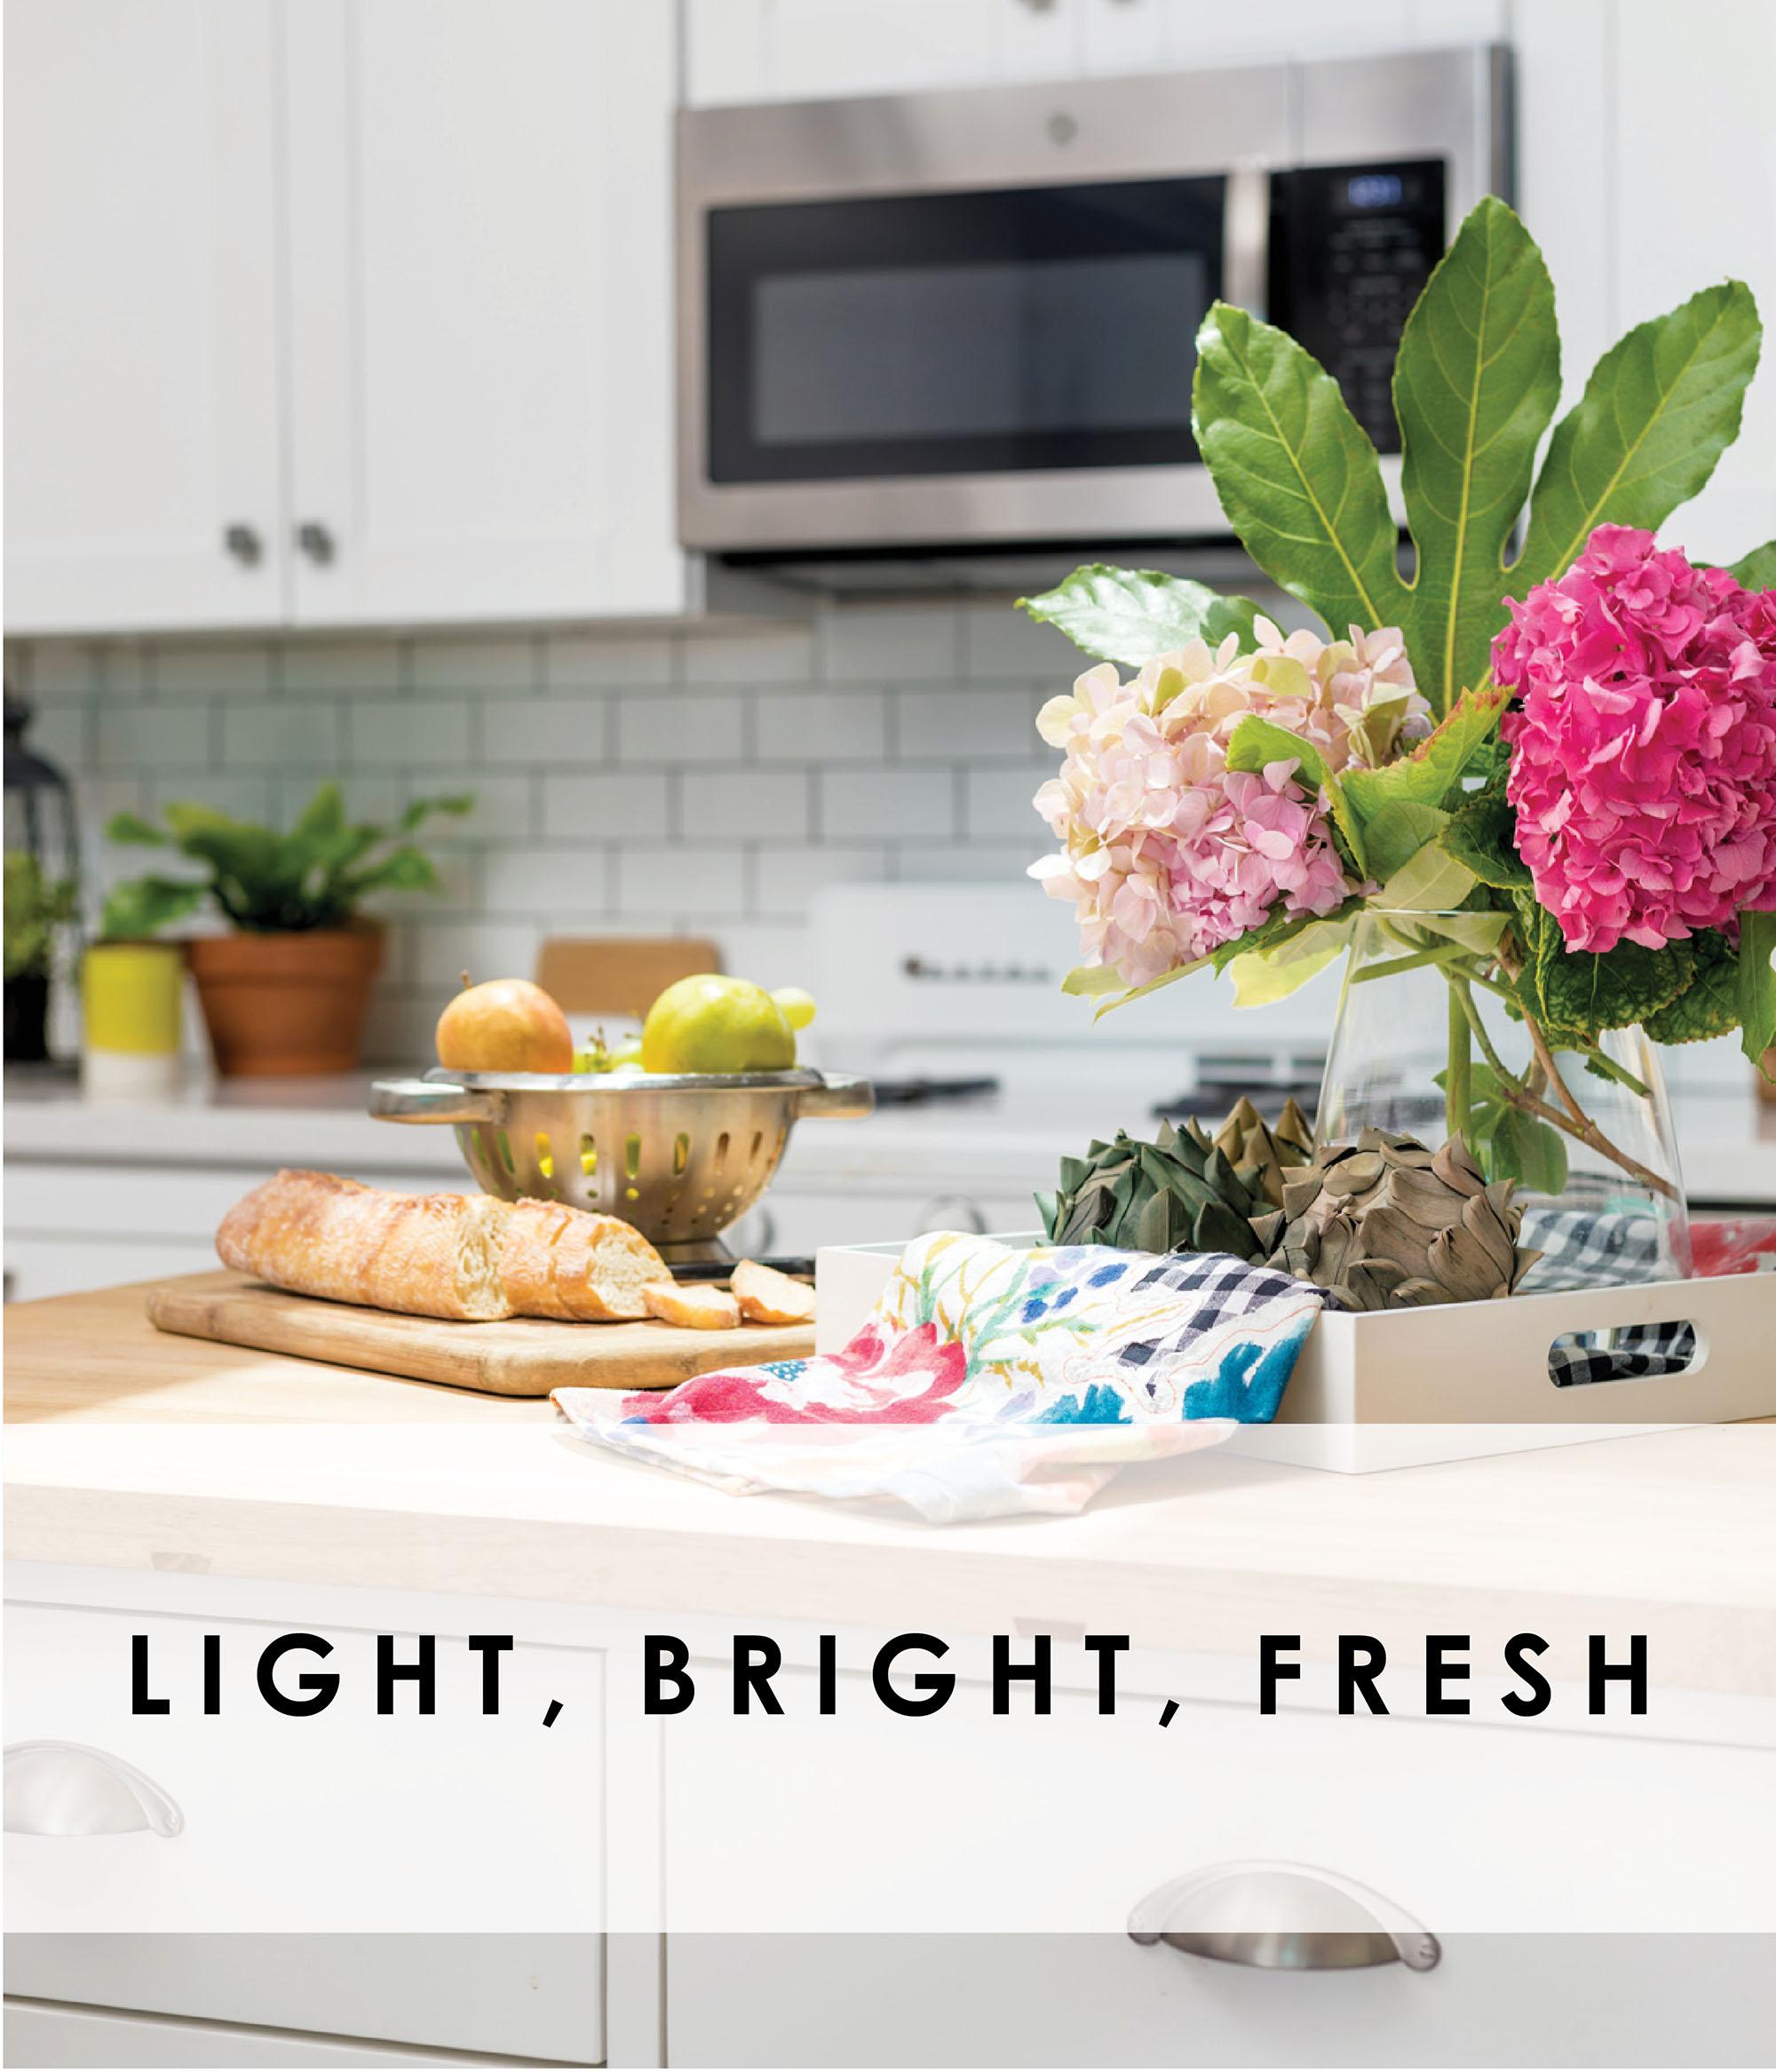 Light Bright Fresh.jpg